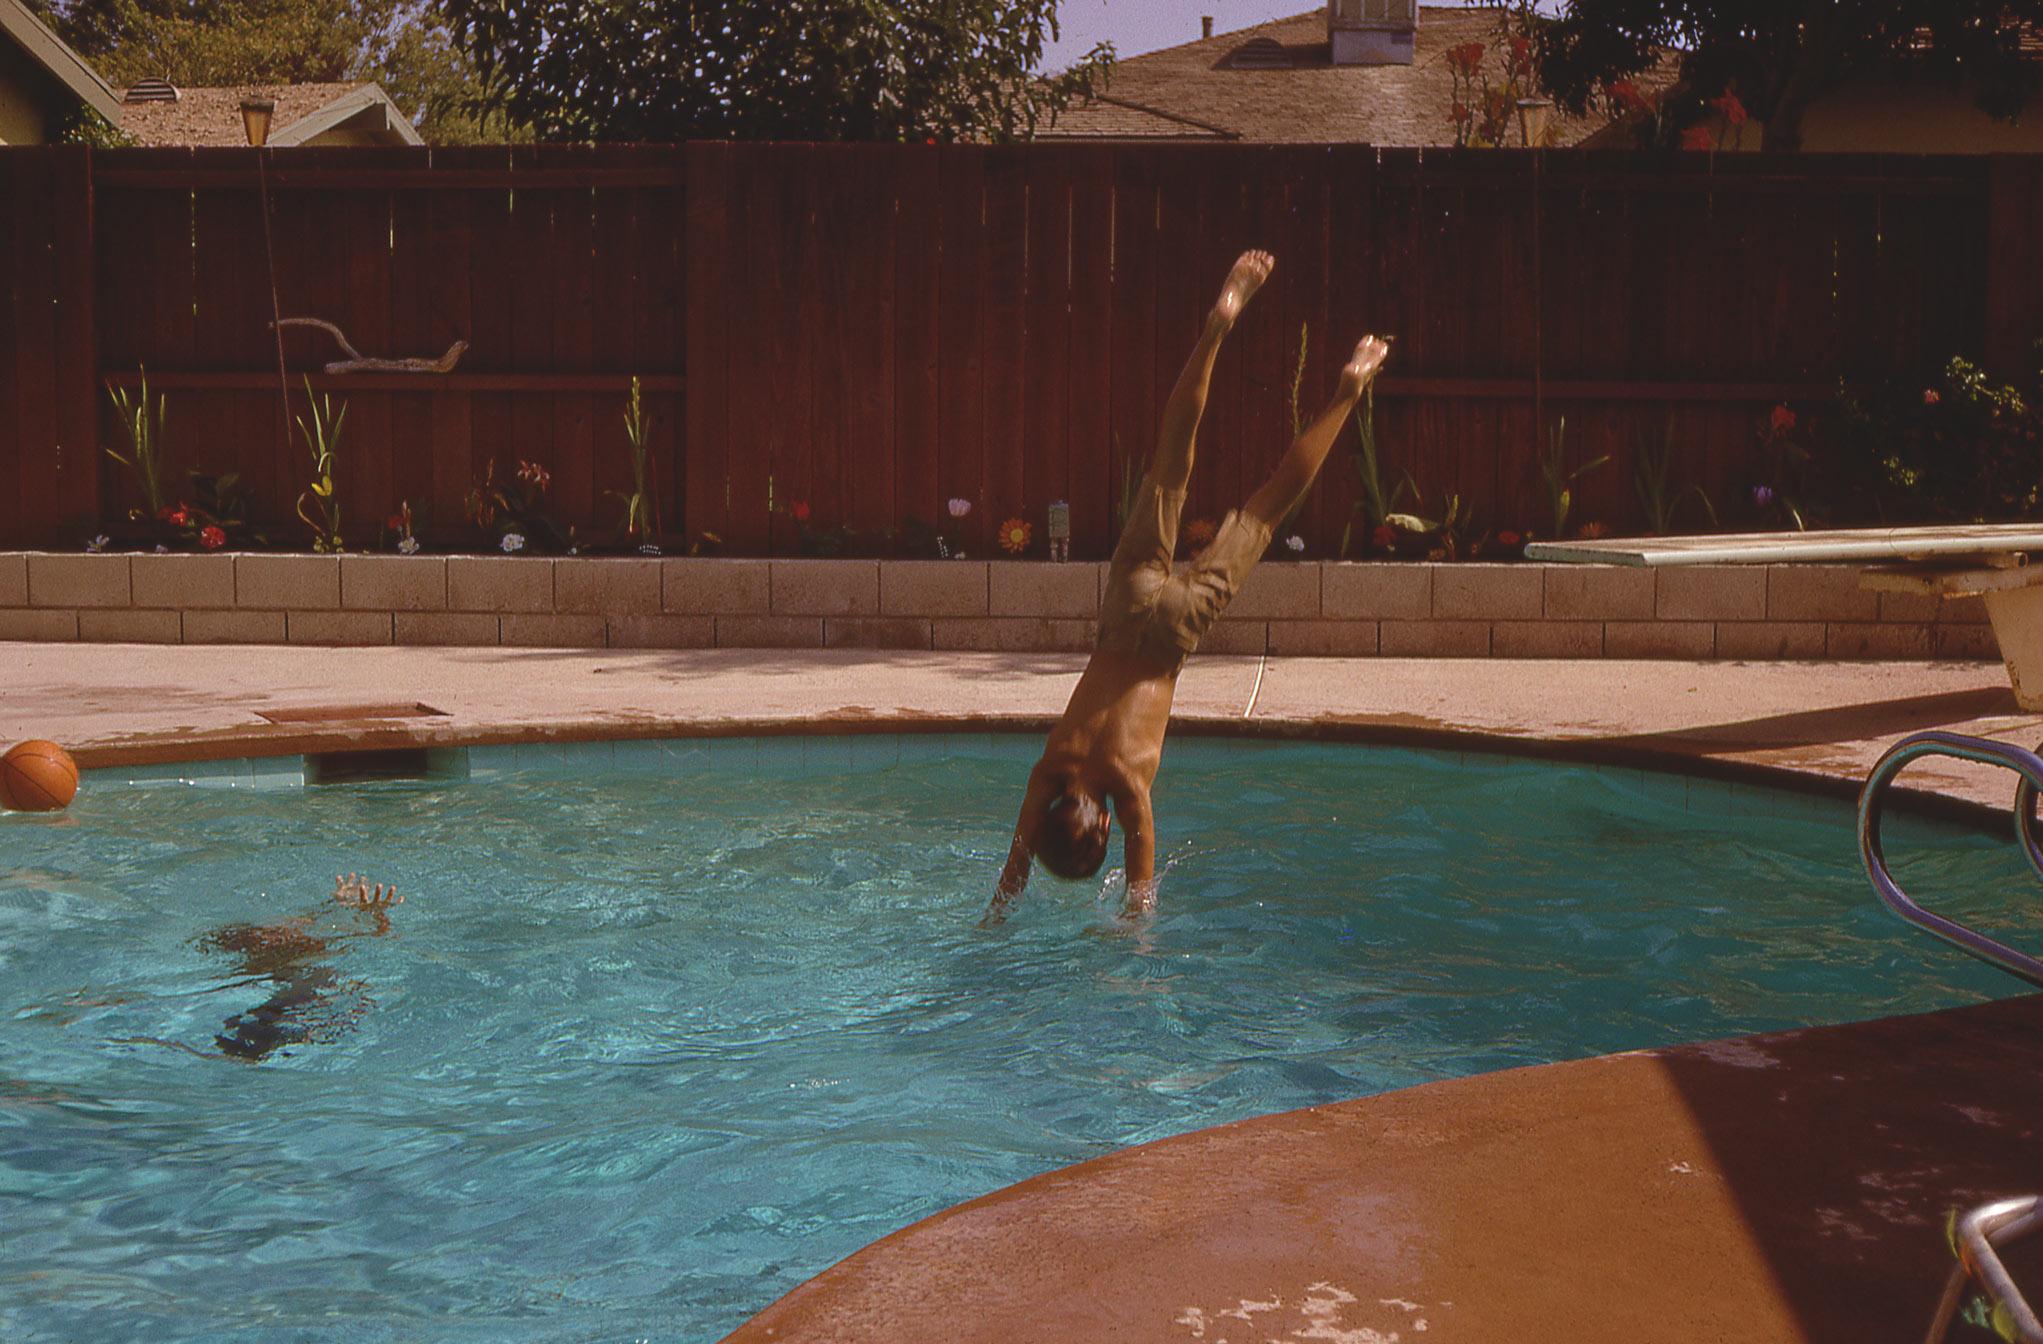 Michael Wiggins, Los Angeles, CA, 1971 (photo: James W. Wiggins, Jr. )